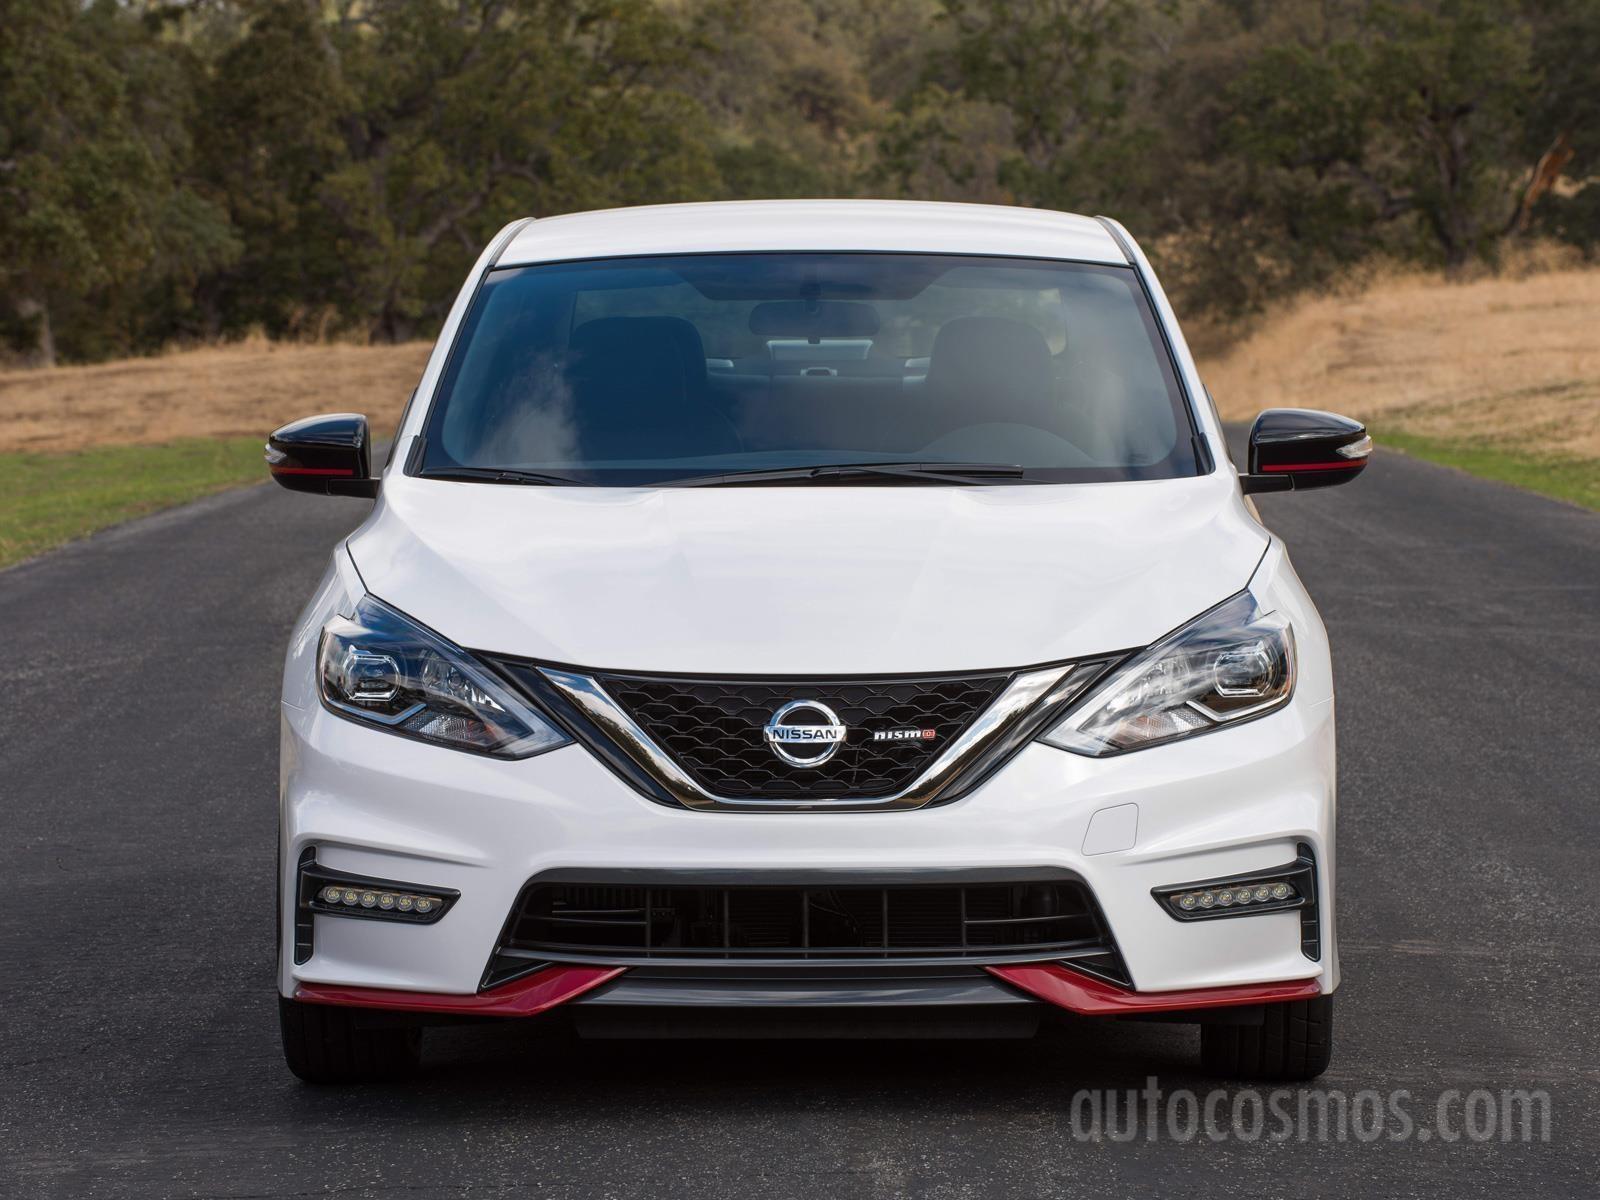 Nissan Sentra Nismo 2018 Llega A M 233 Xico En 437 400 Pesos